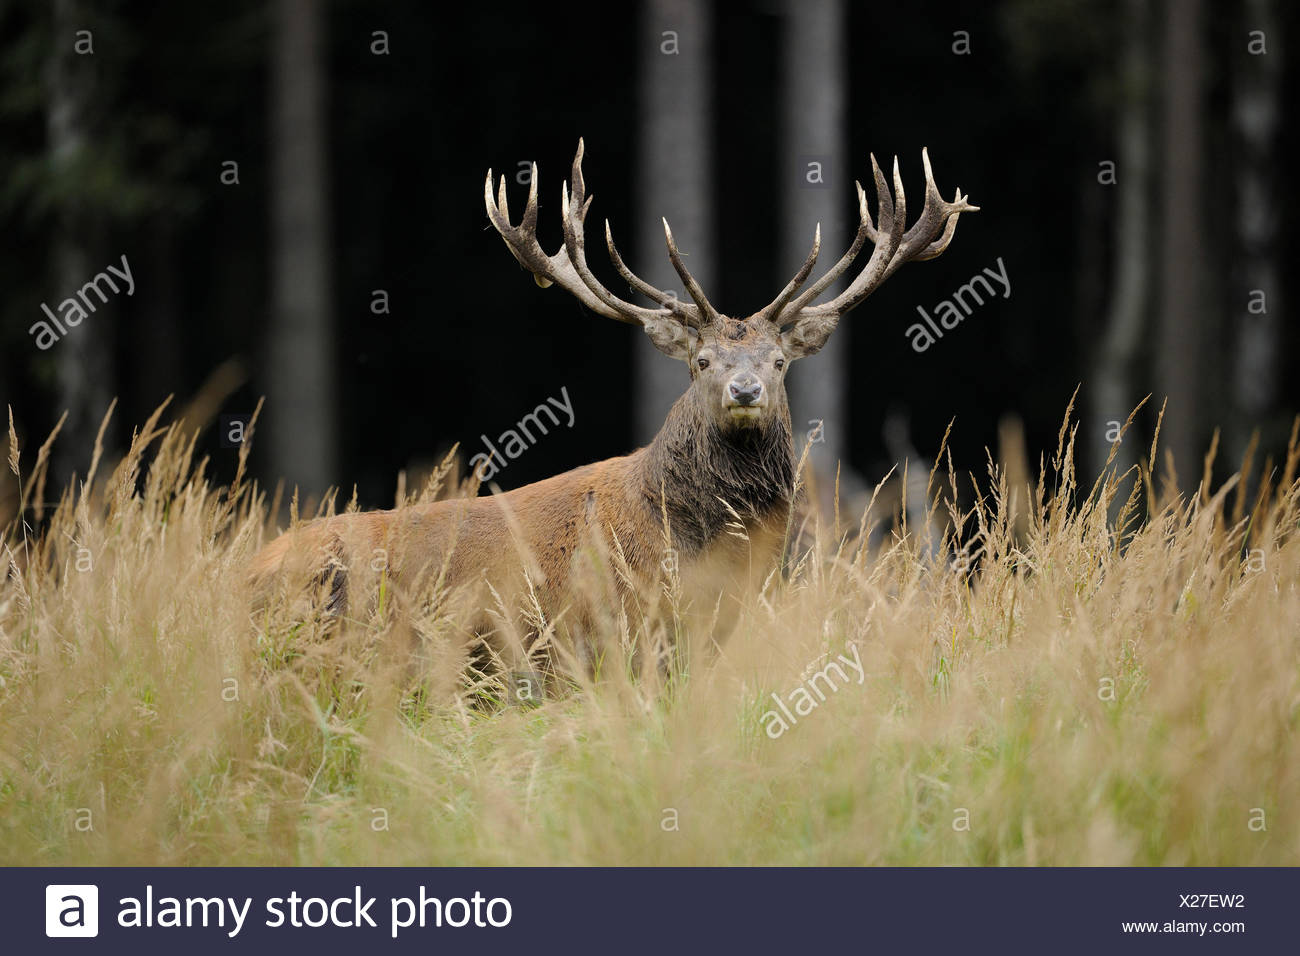 Il cervo (Cervus elaphus), feste di addio al celibato, captive, Bassa Sassonia, Germania Immagini Stock